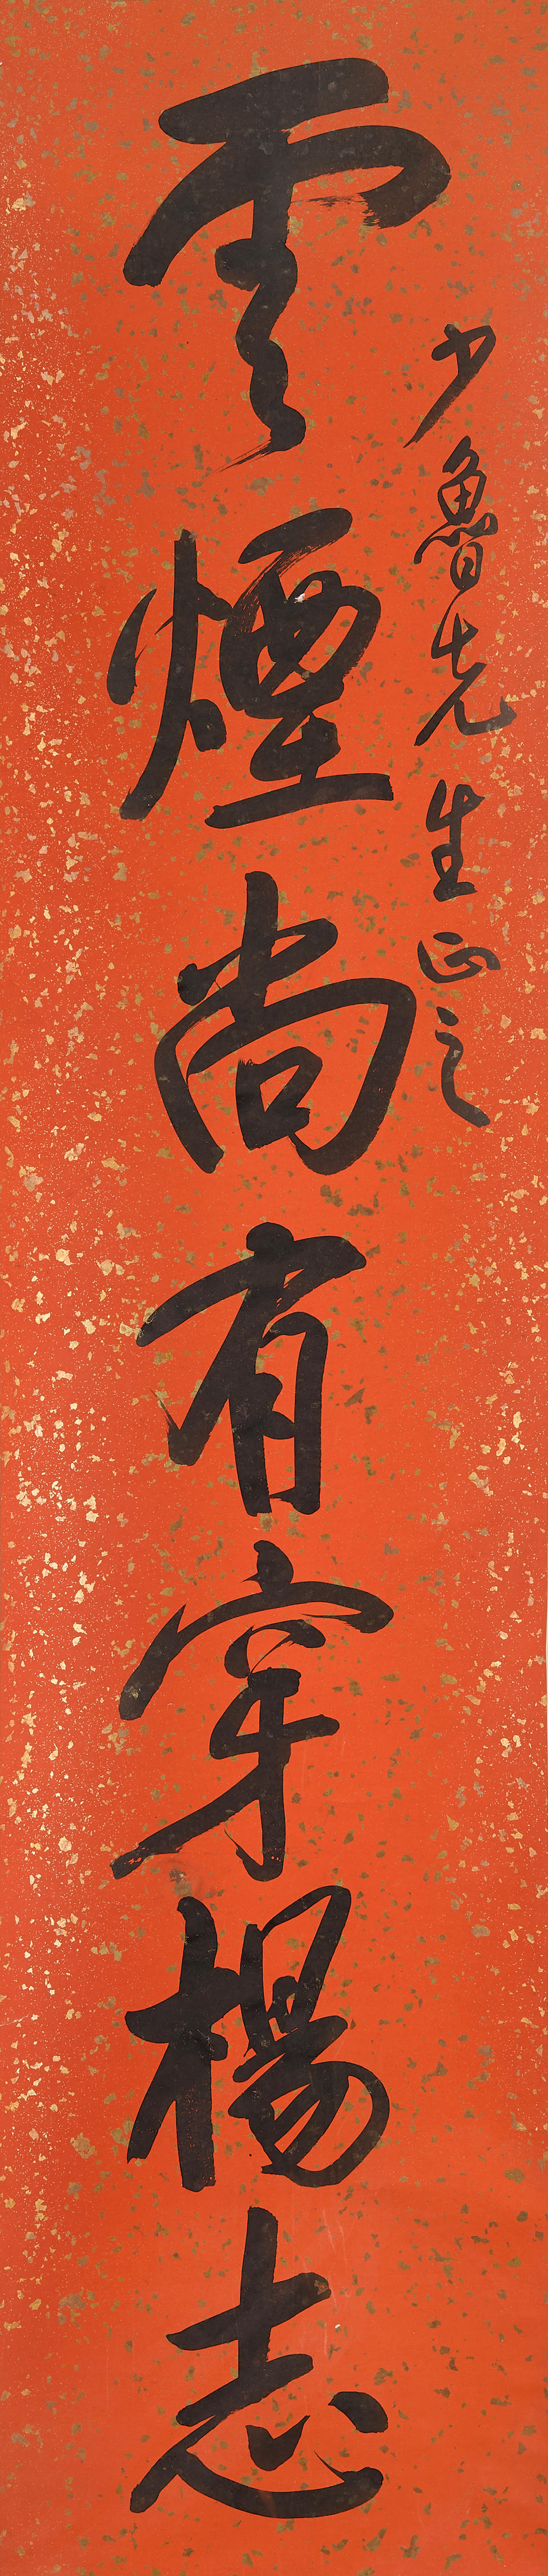 Wang Zhen (1867-1938)  Calligraphy in Running Script